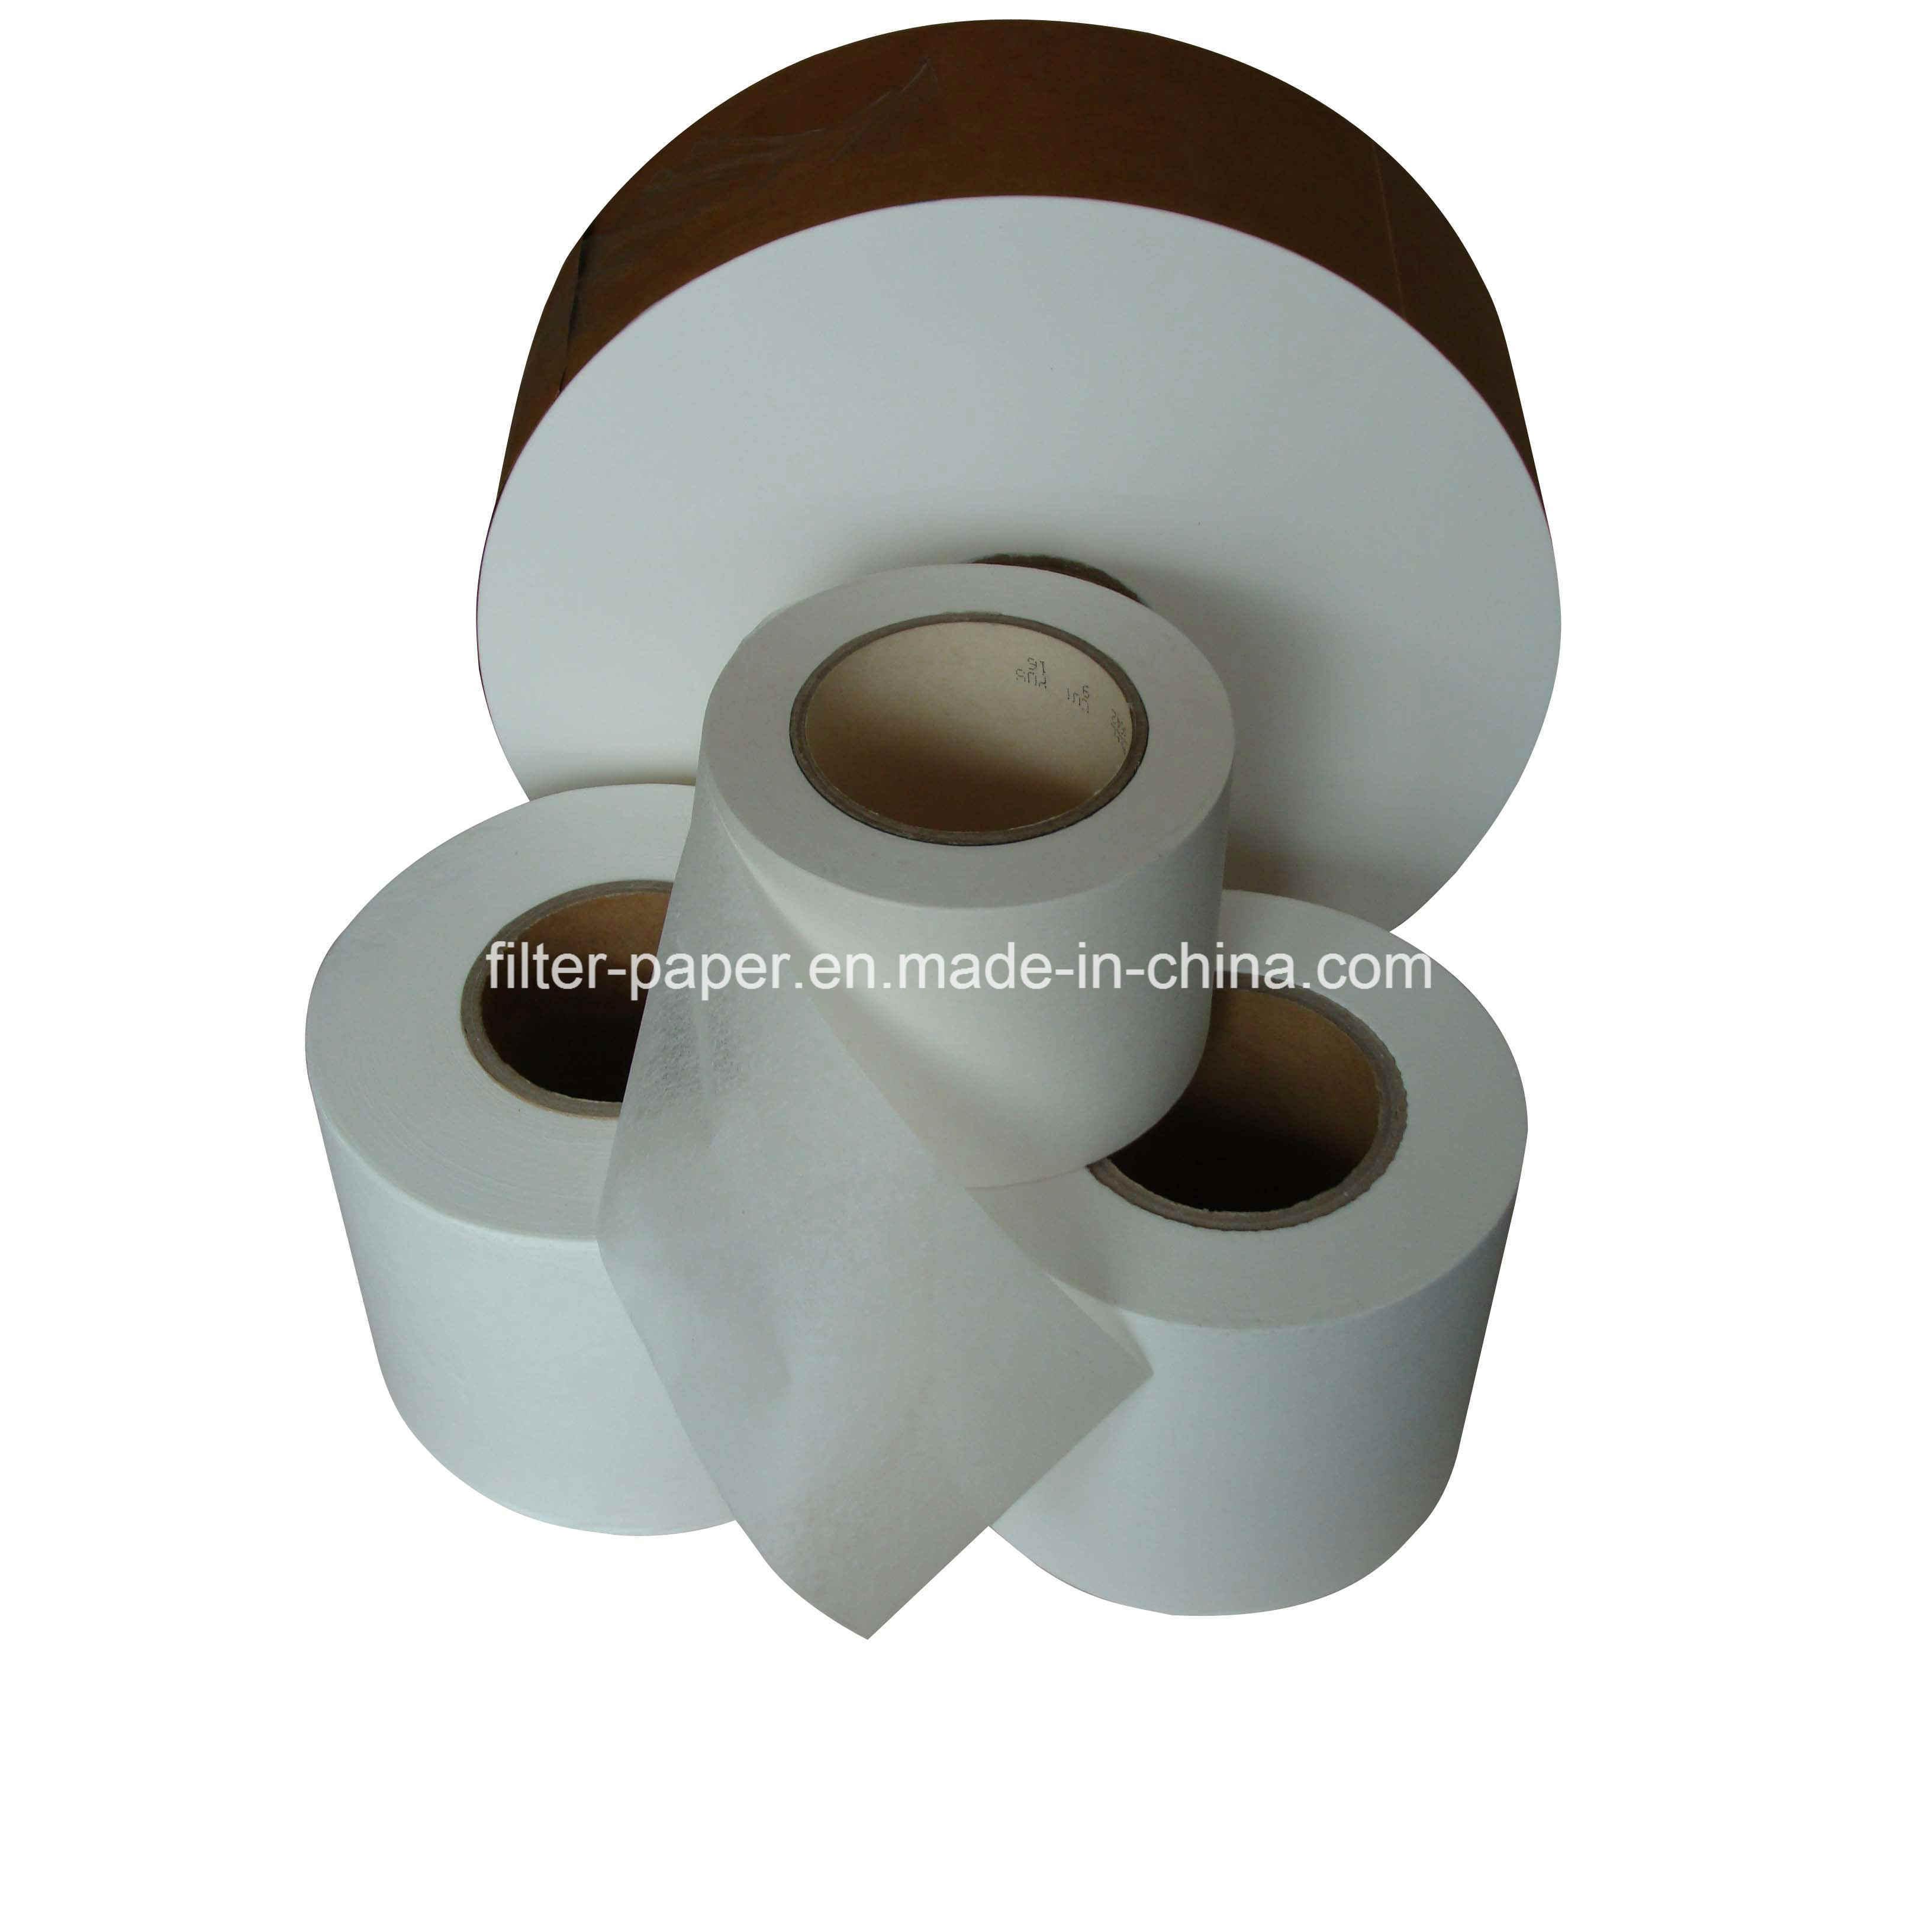 12.5G/M2 Non Heat Seal Tea Bag Filter Paper